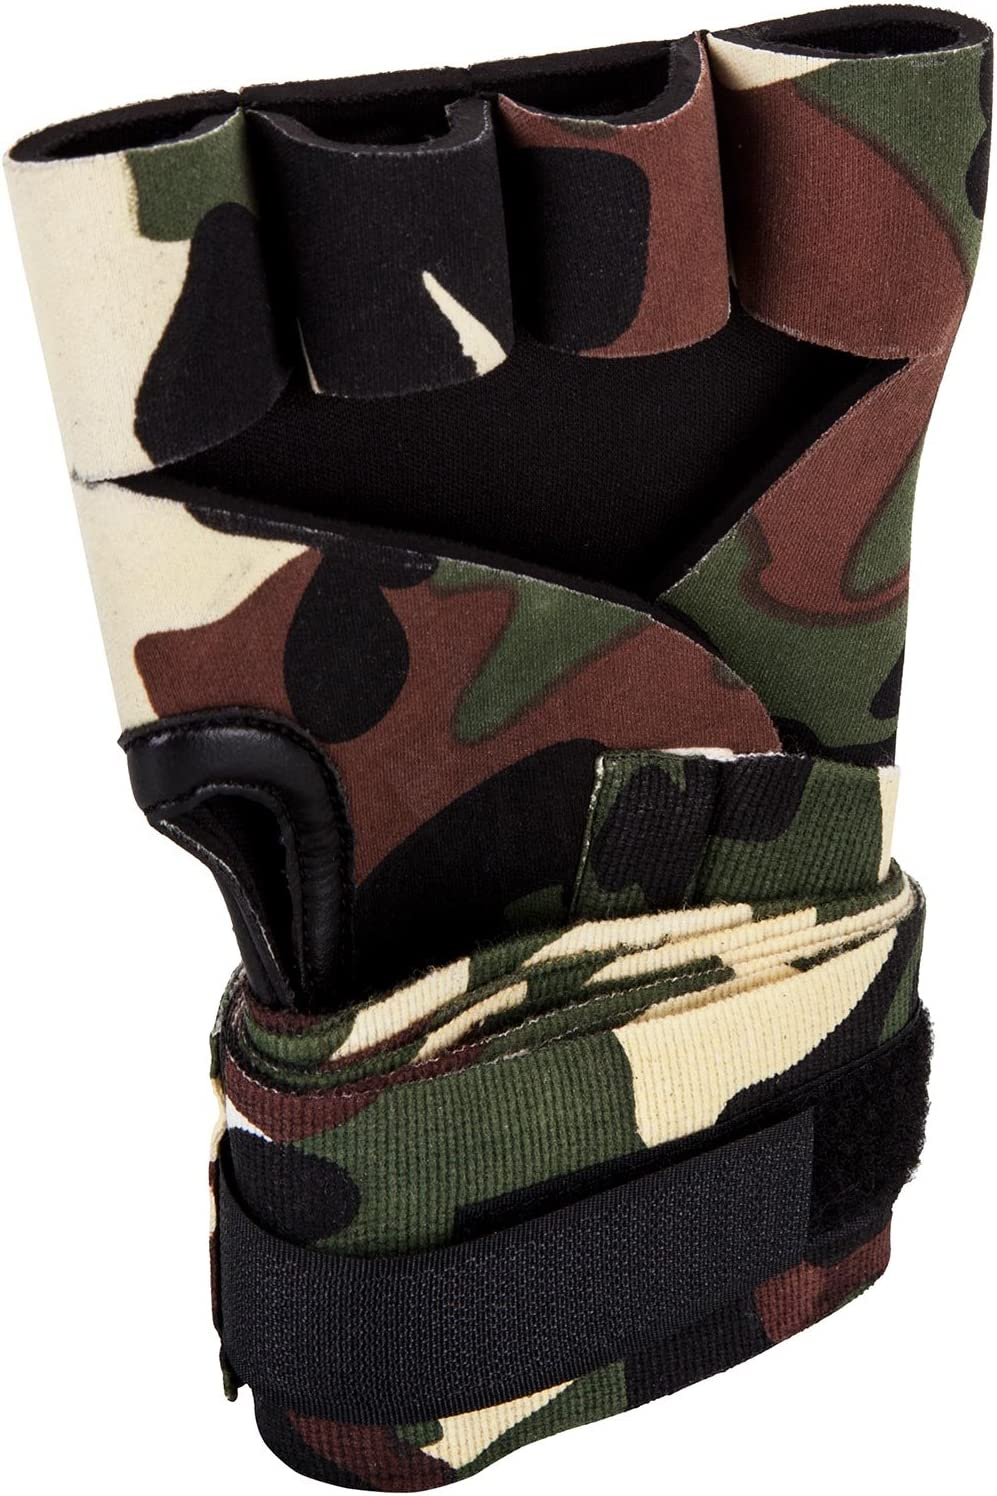 Black Venum Kontact Gel Glove Wraps